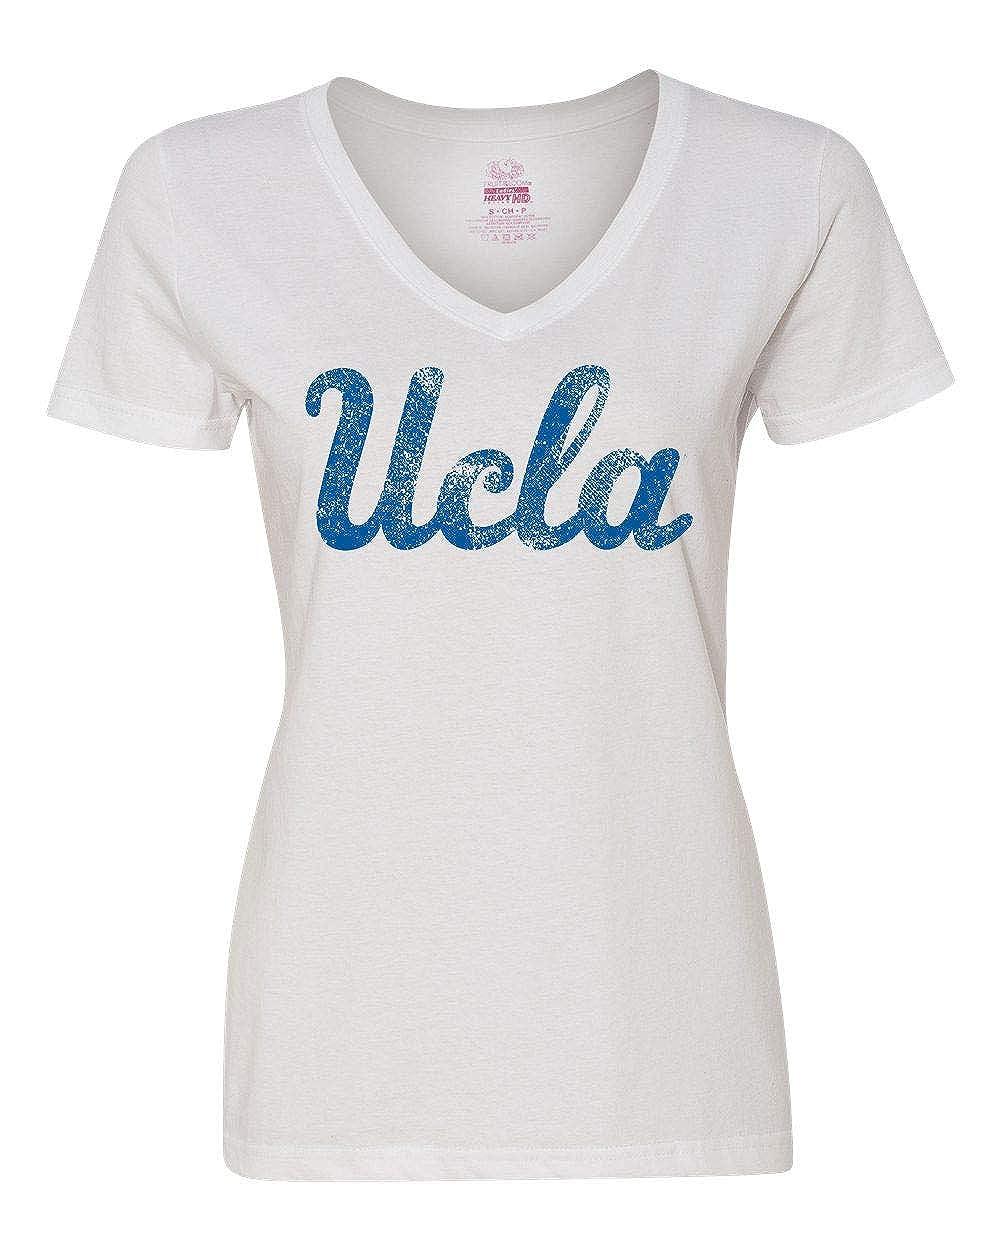 Amazon com: UCLA Script Distressed V-Neck T-Shirt White: Clothing